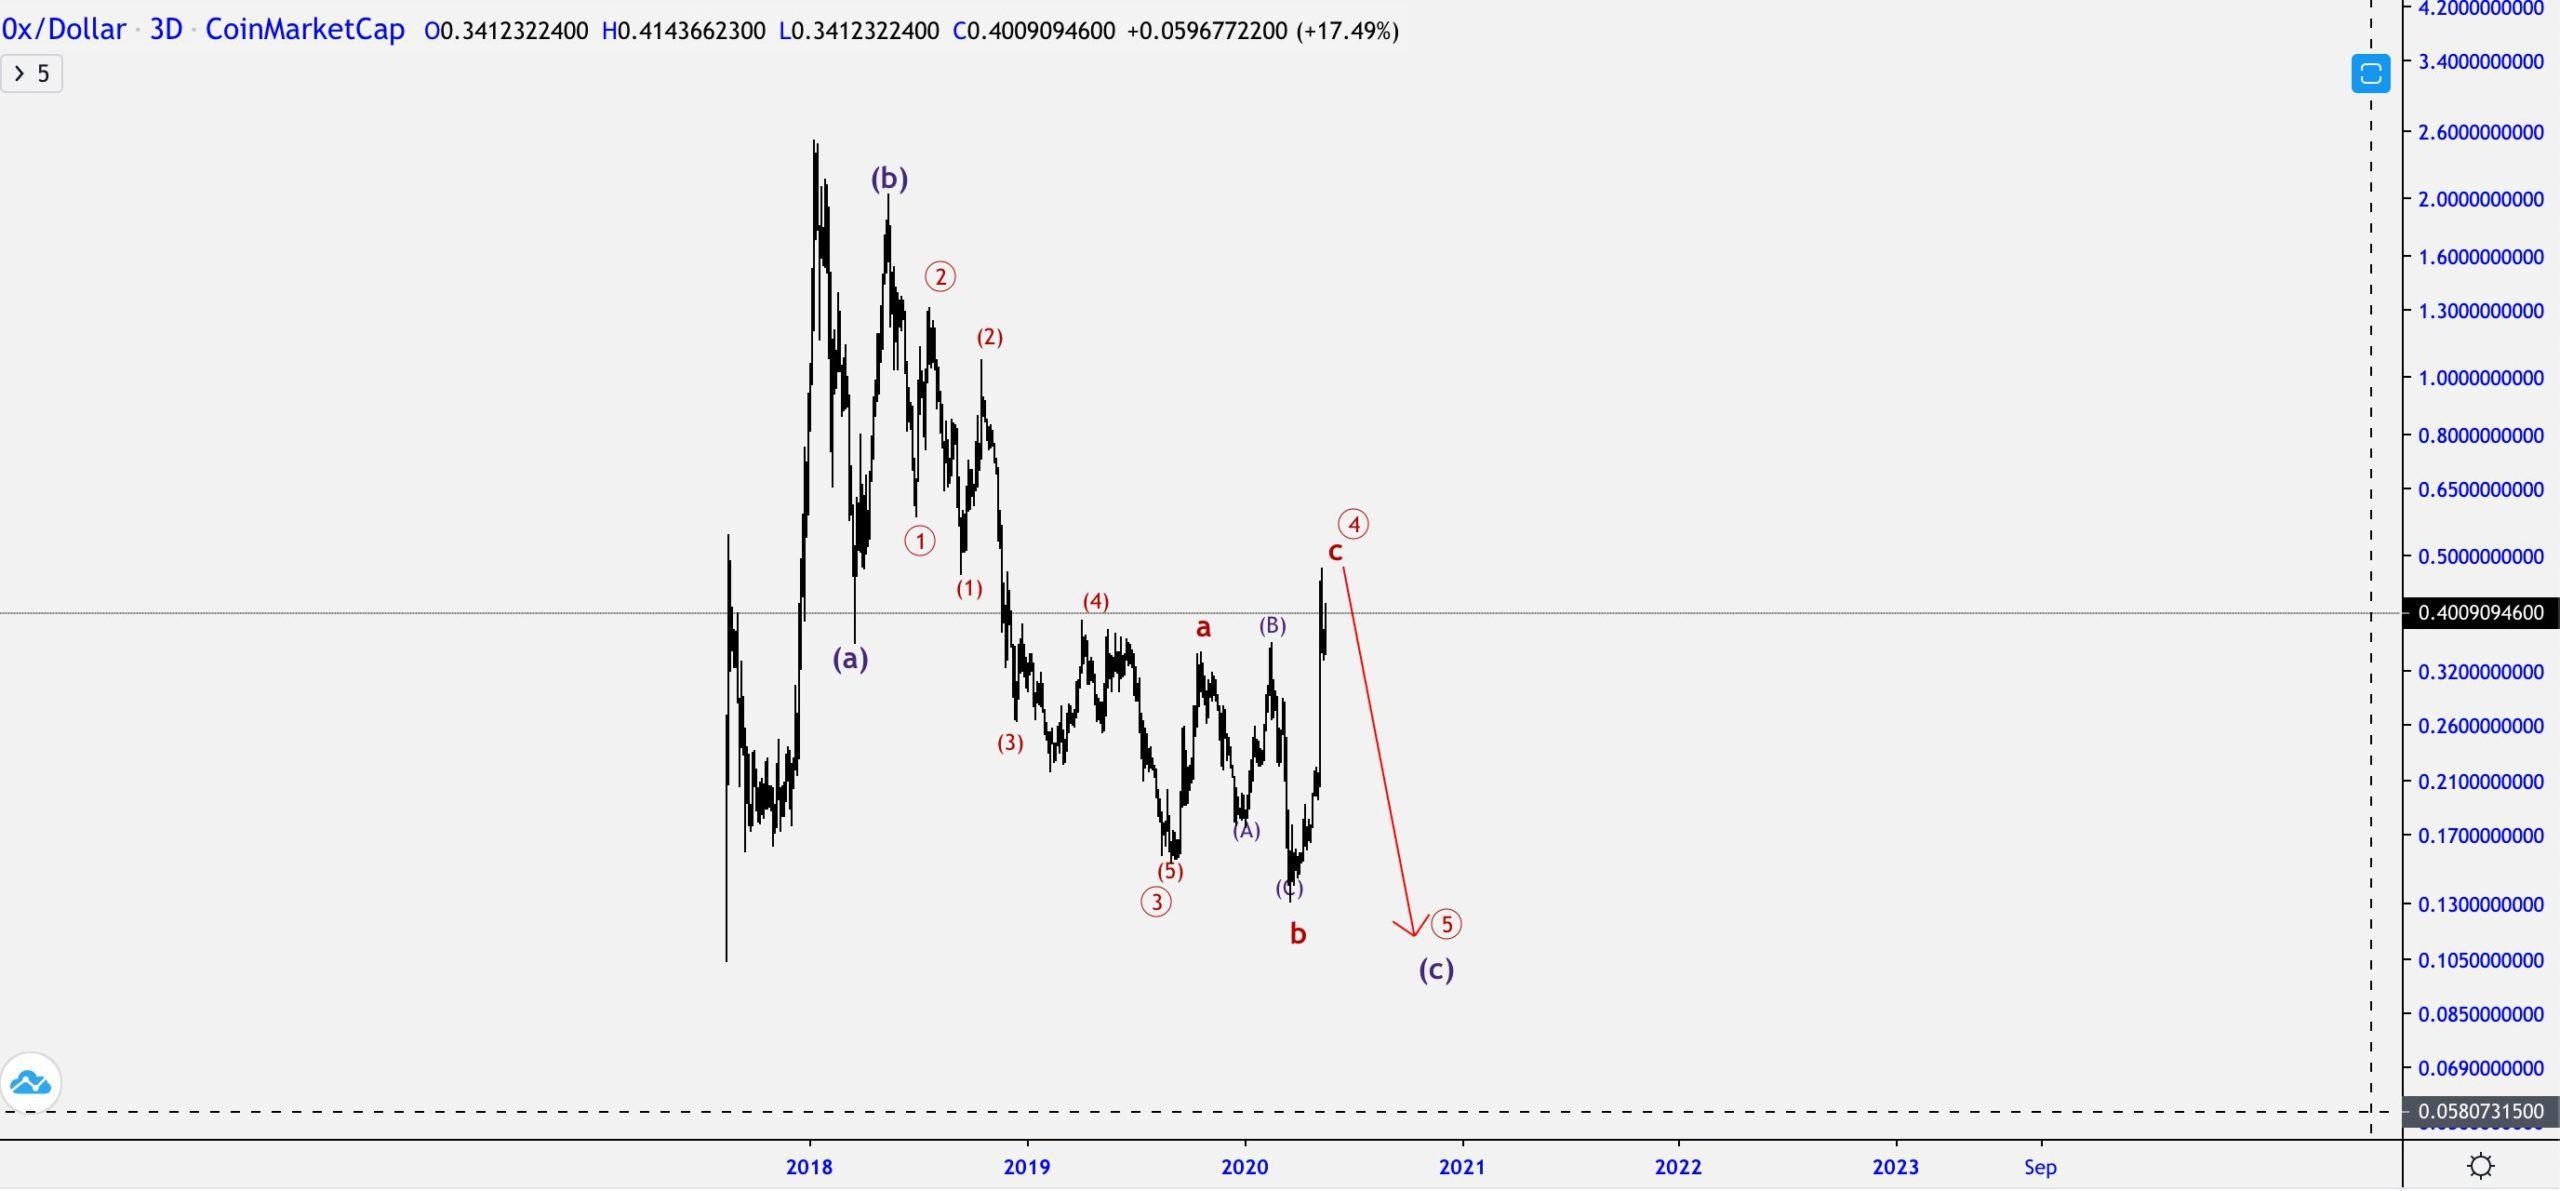 ZRX Price Movement